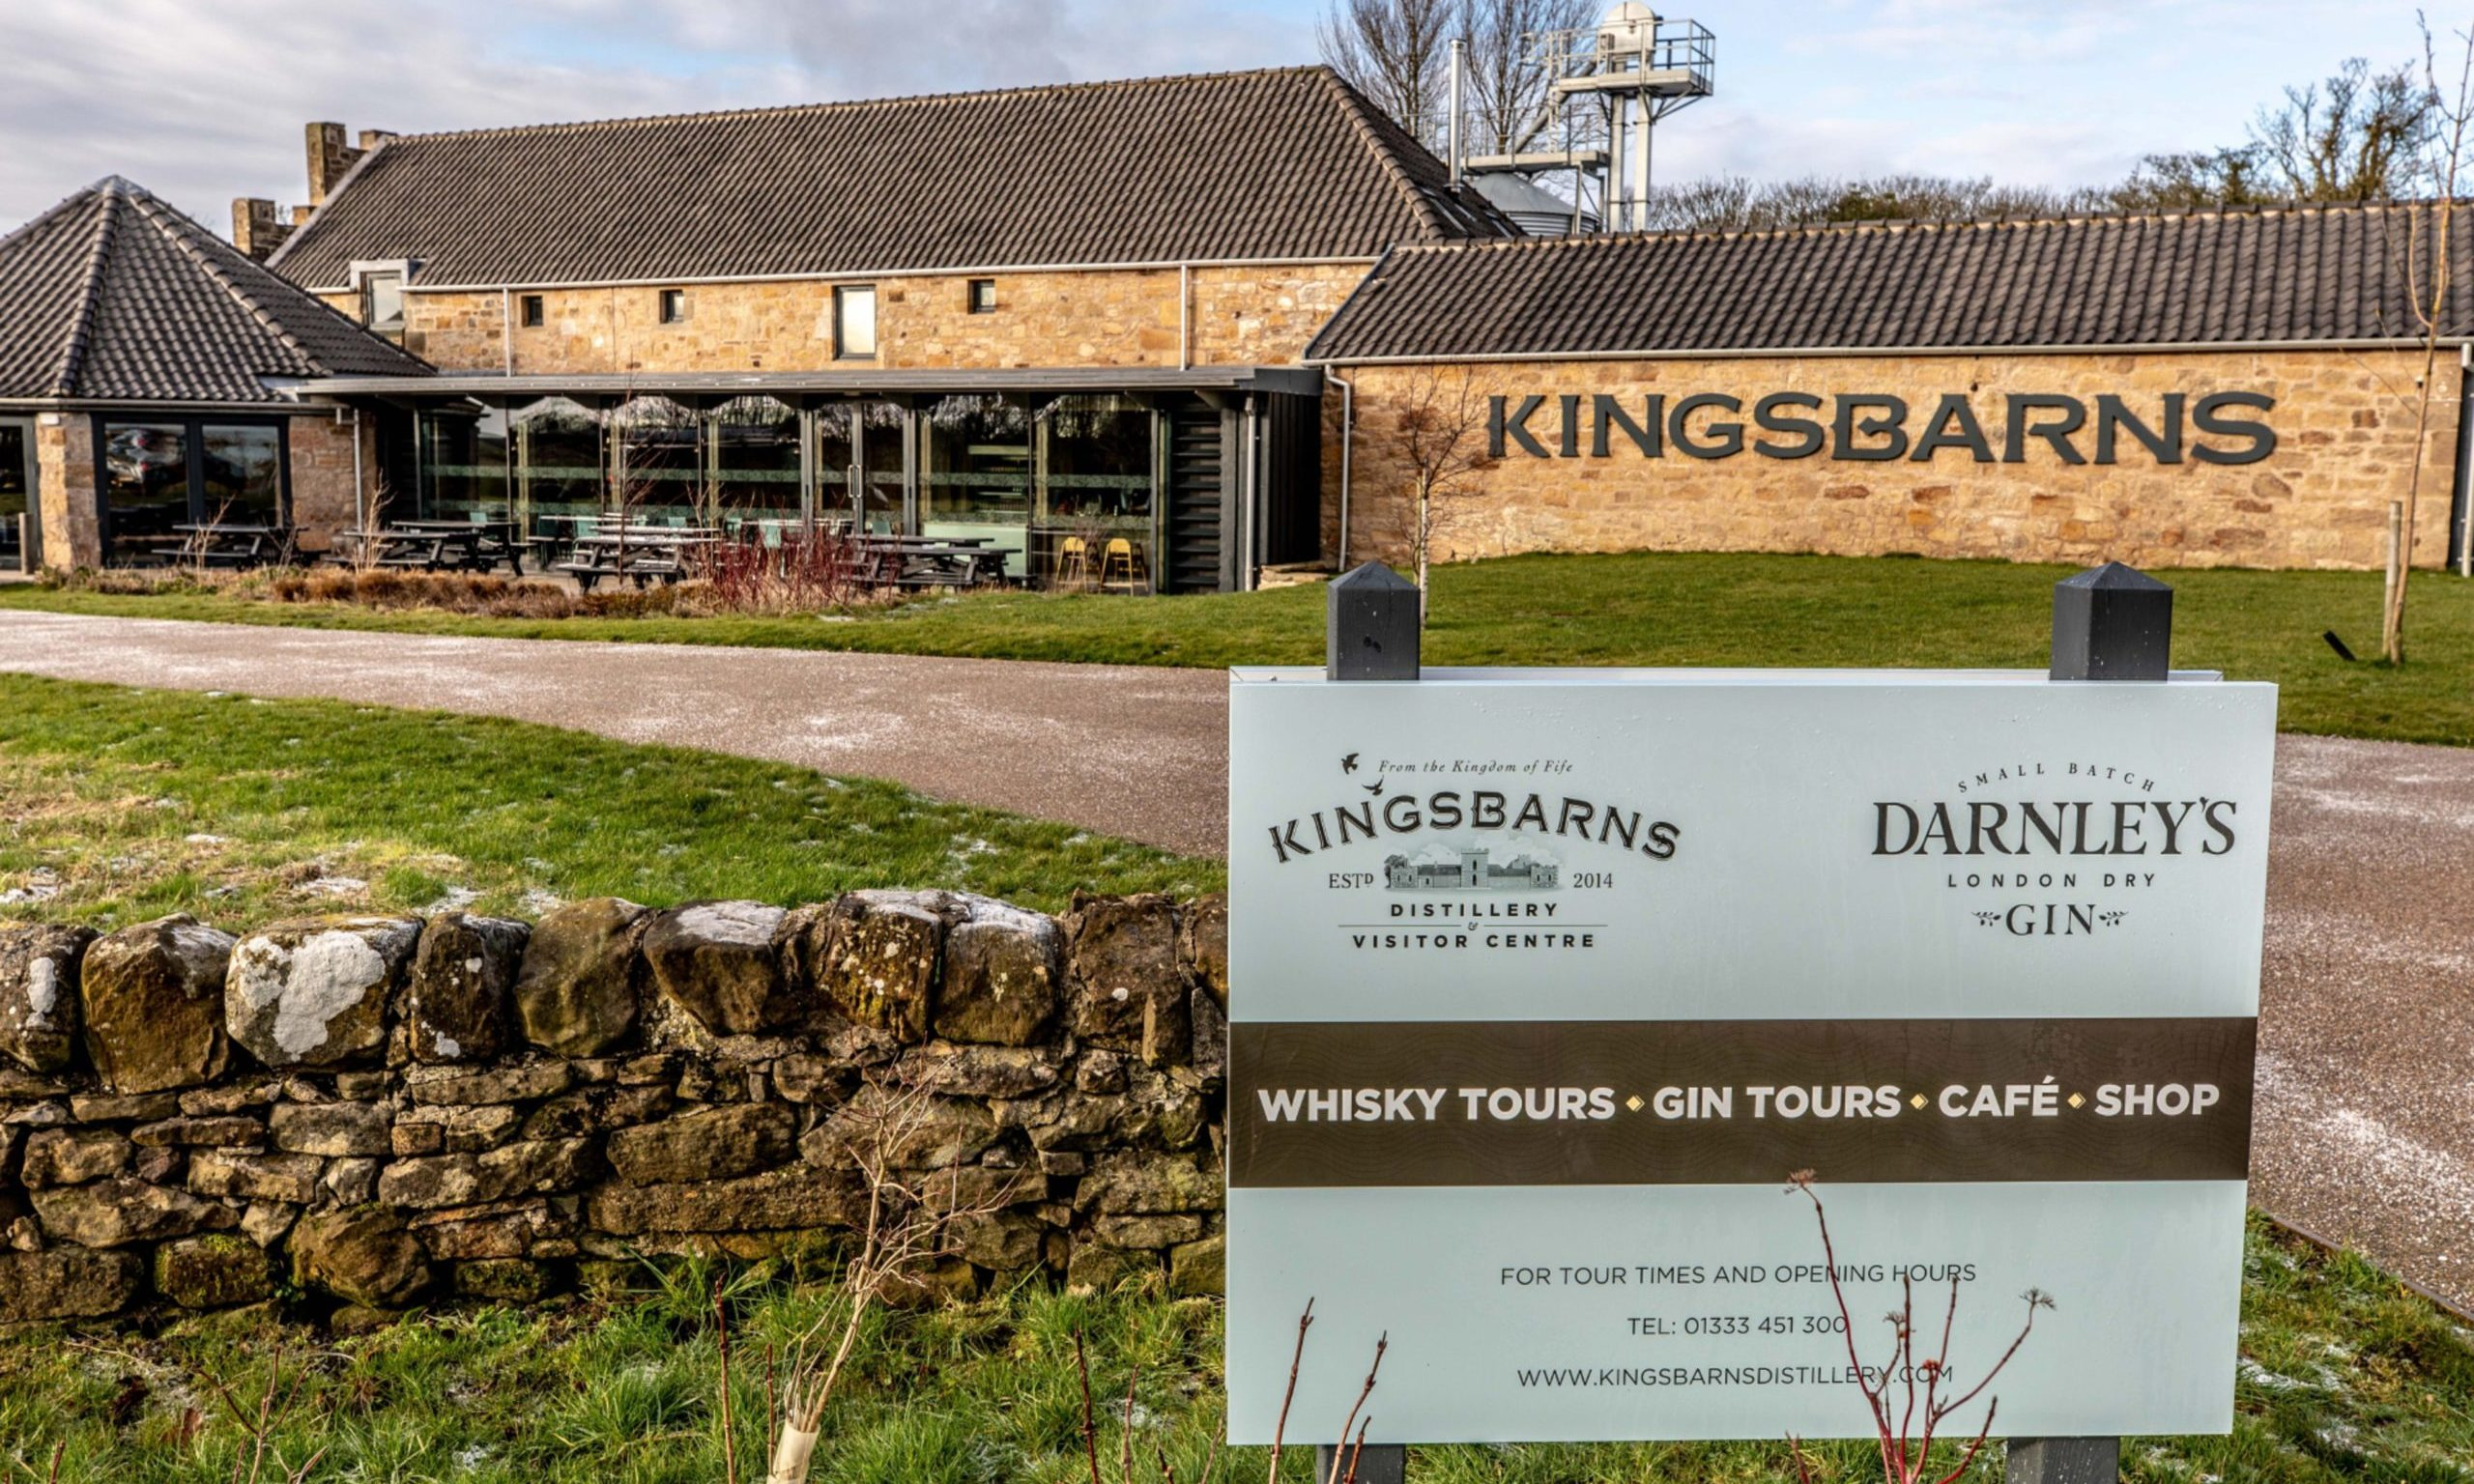 Kingsbarns Distillery Owner Reports Slump In Sales photo